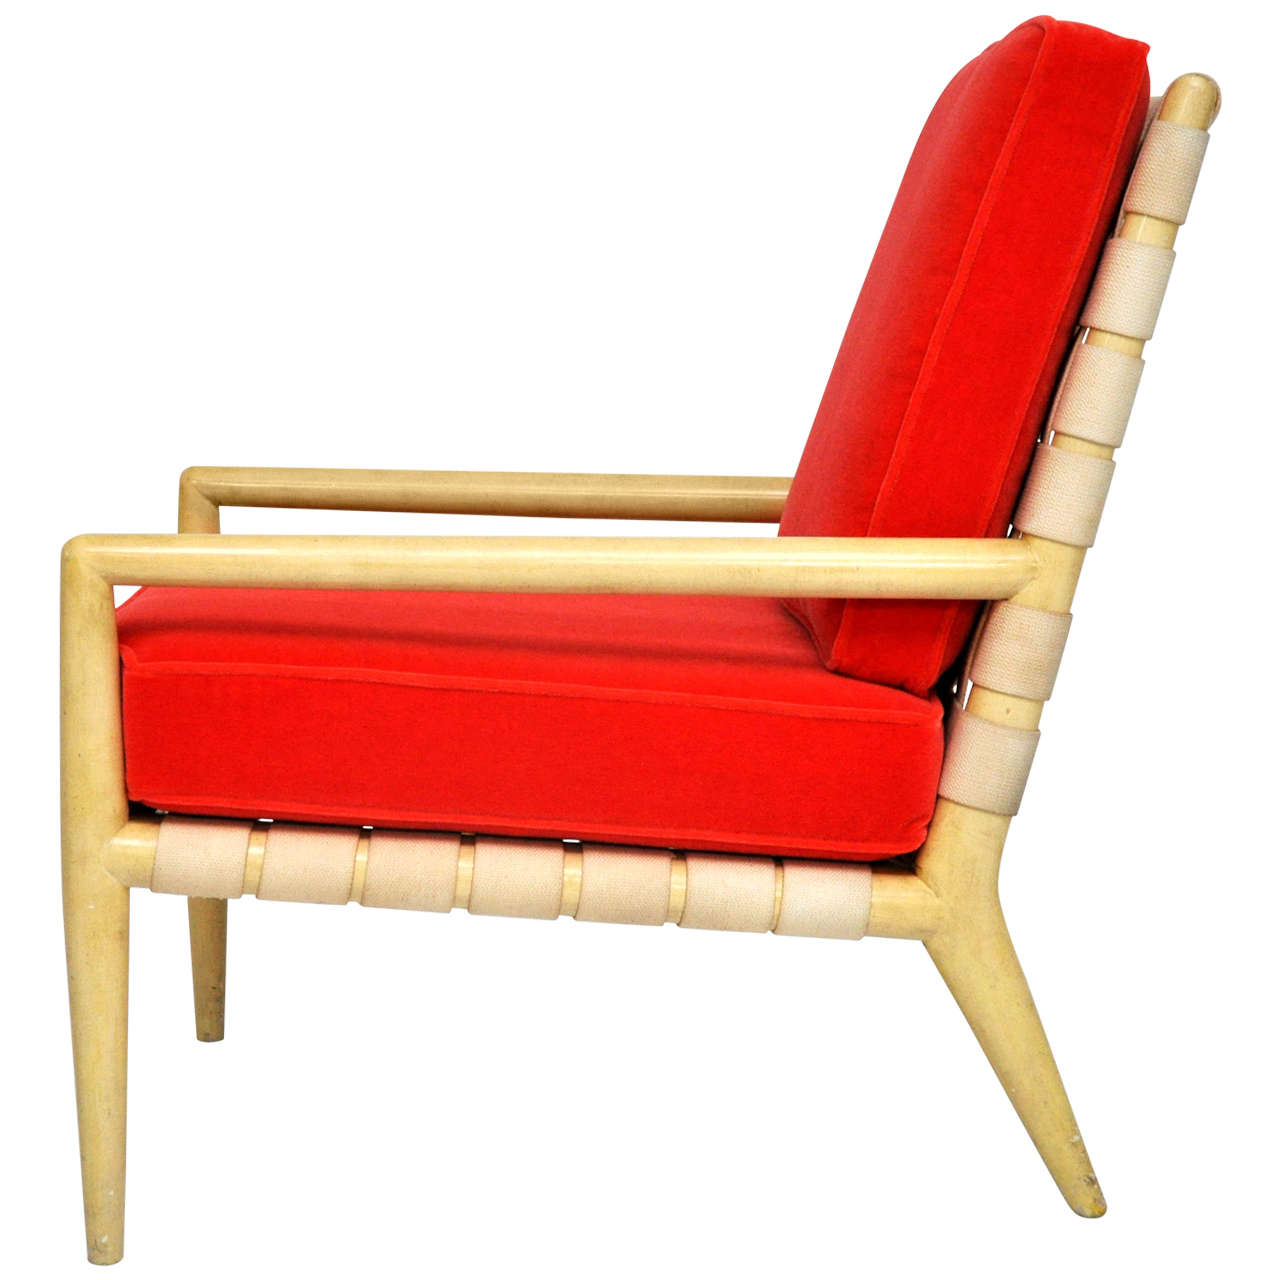 T.H. Robsjohn-Gibbings Strapped Lounge Chair